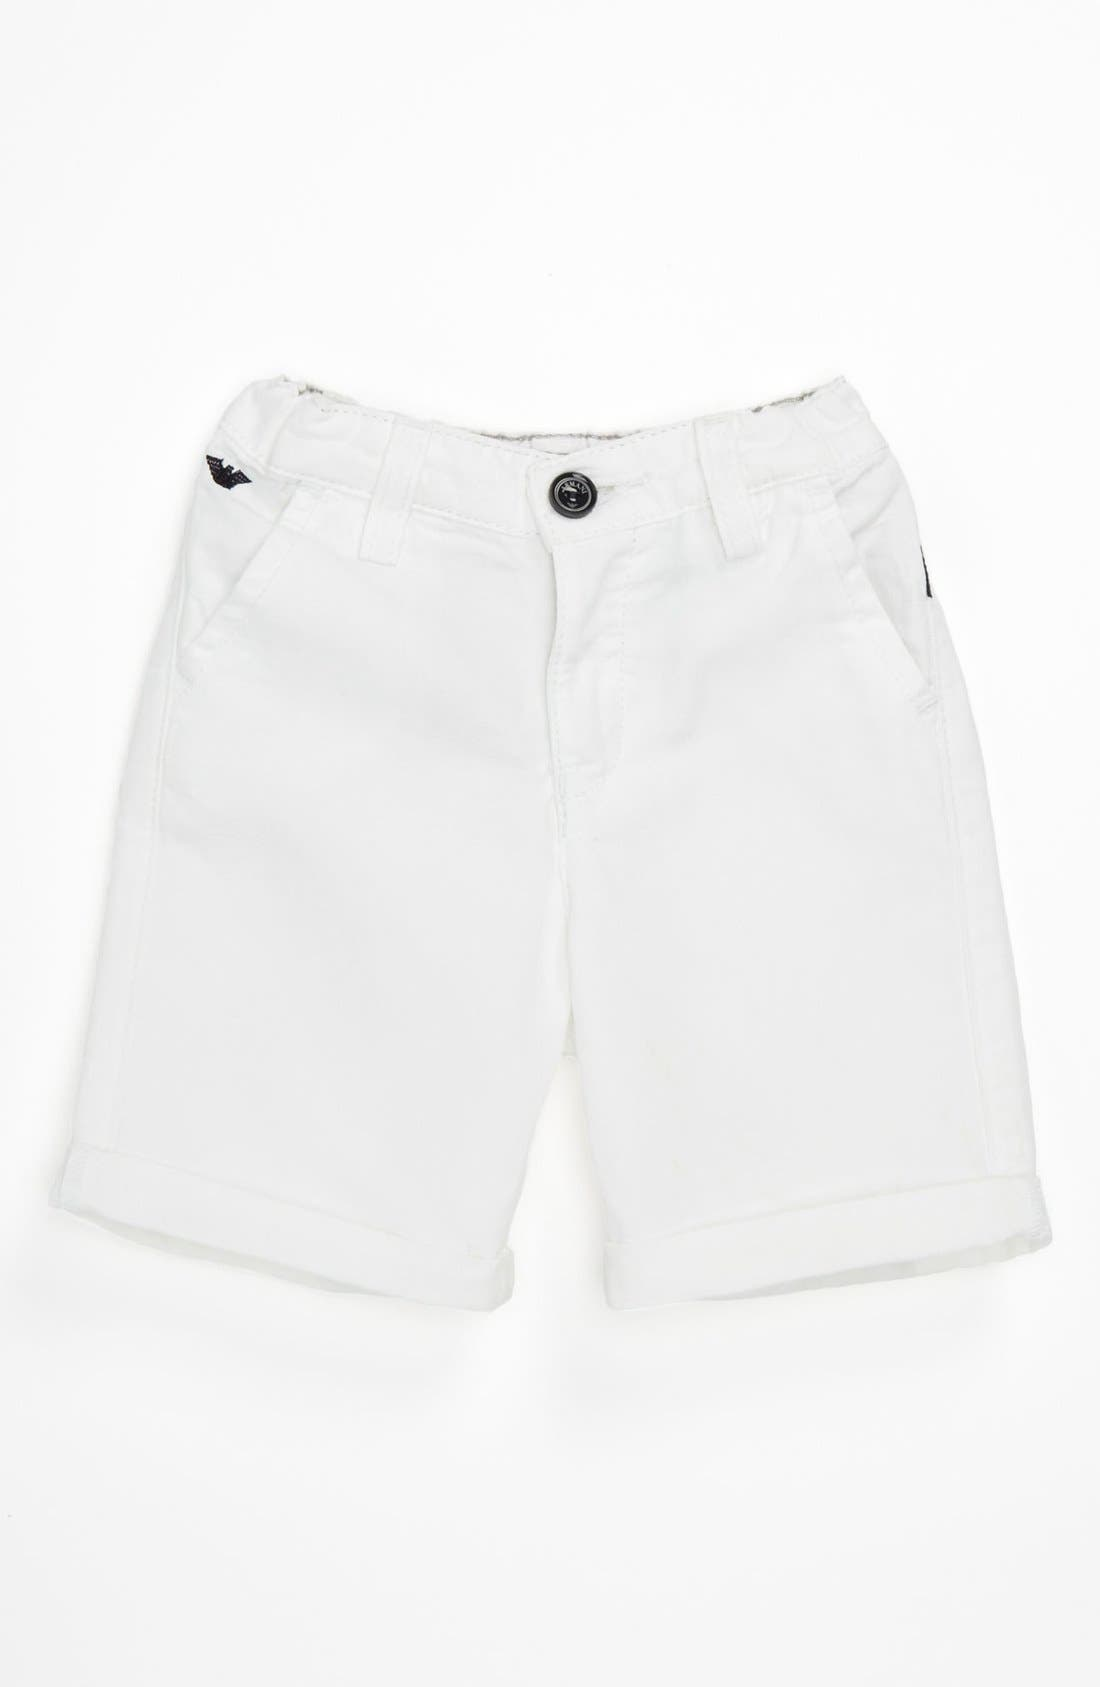 Alternate Image 1 Selected - Armani Junior Shorts (Baby)